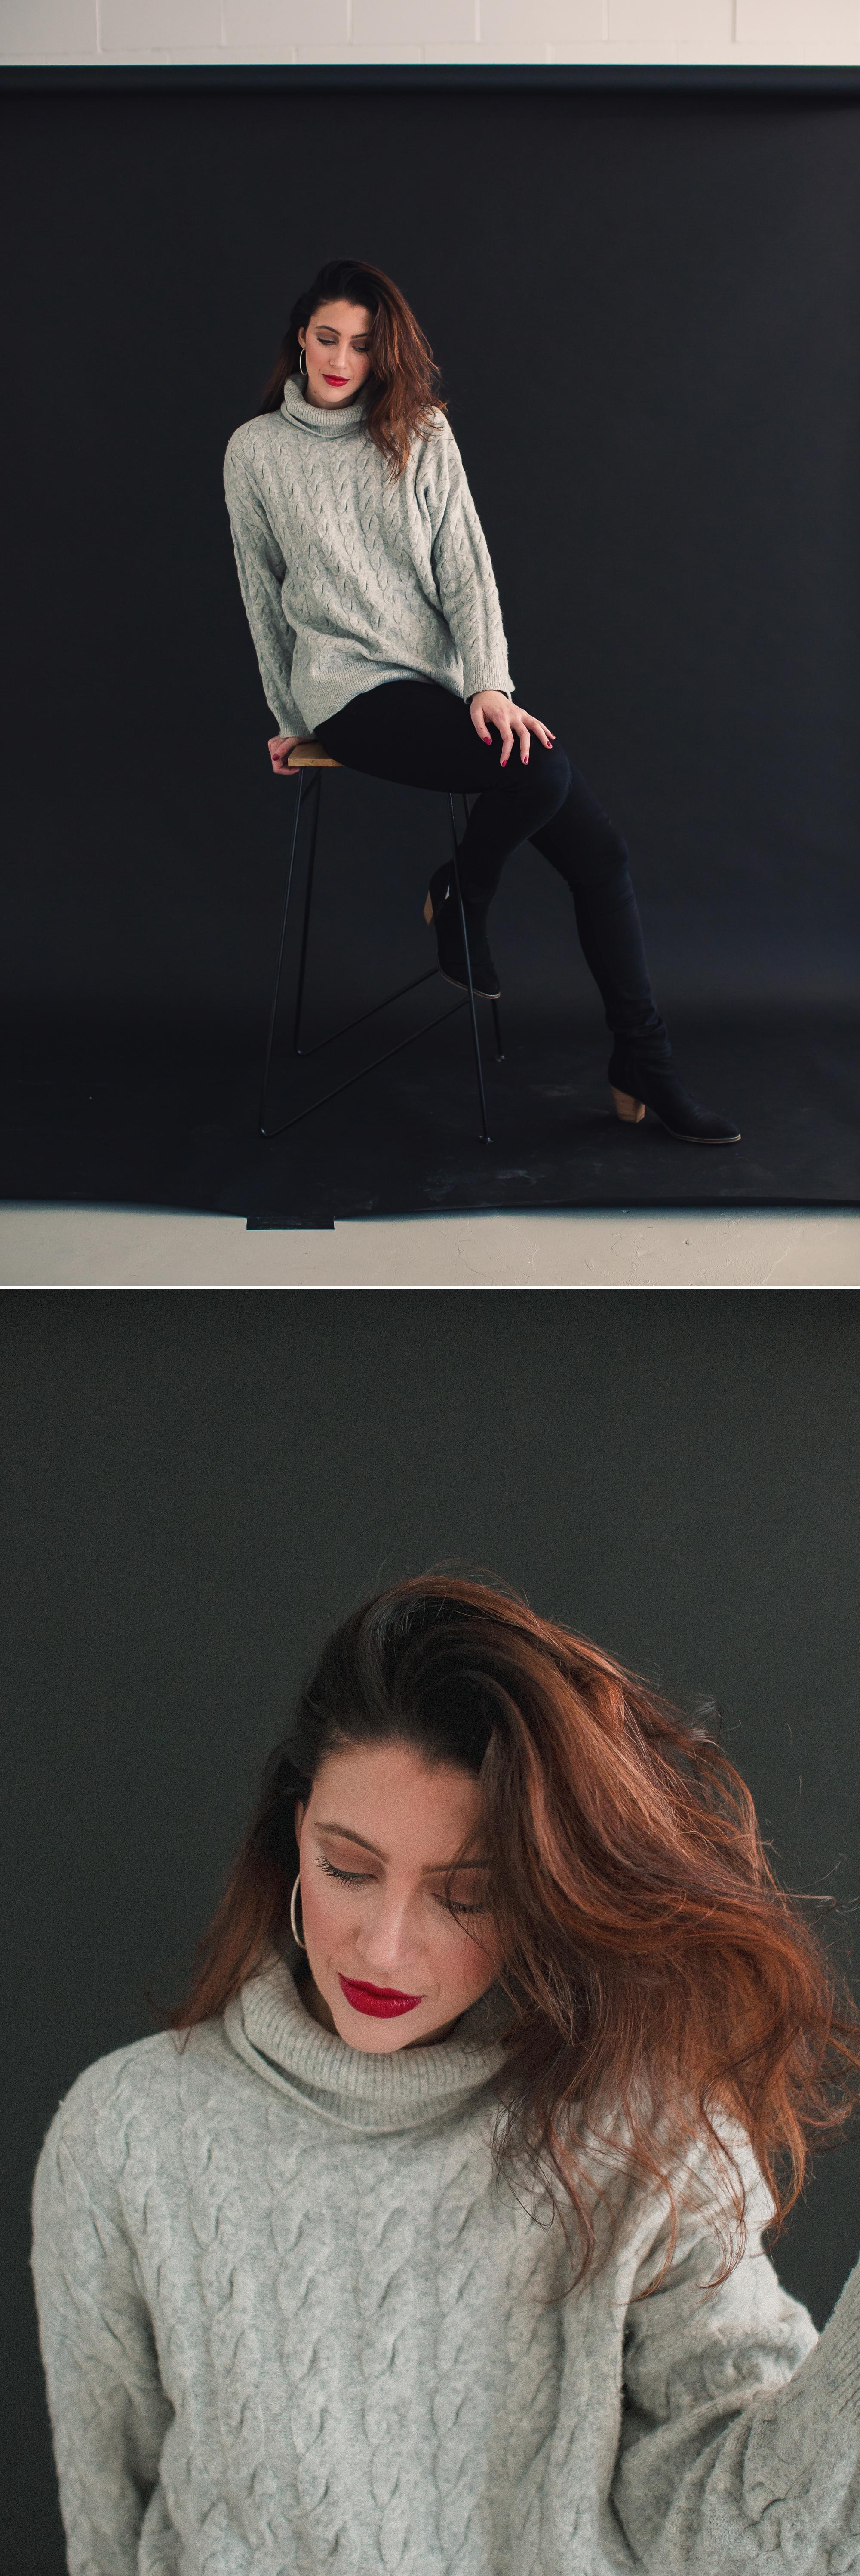 lifestyle-fashion-studio-portrait 6.jpg